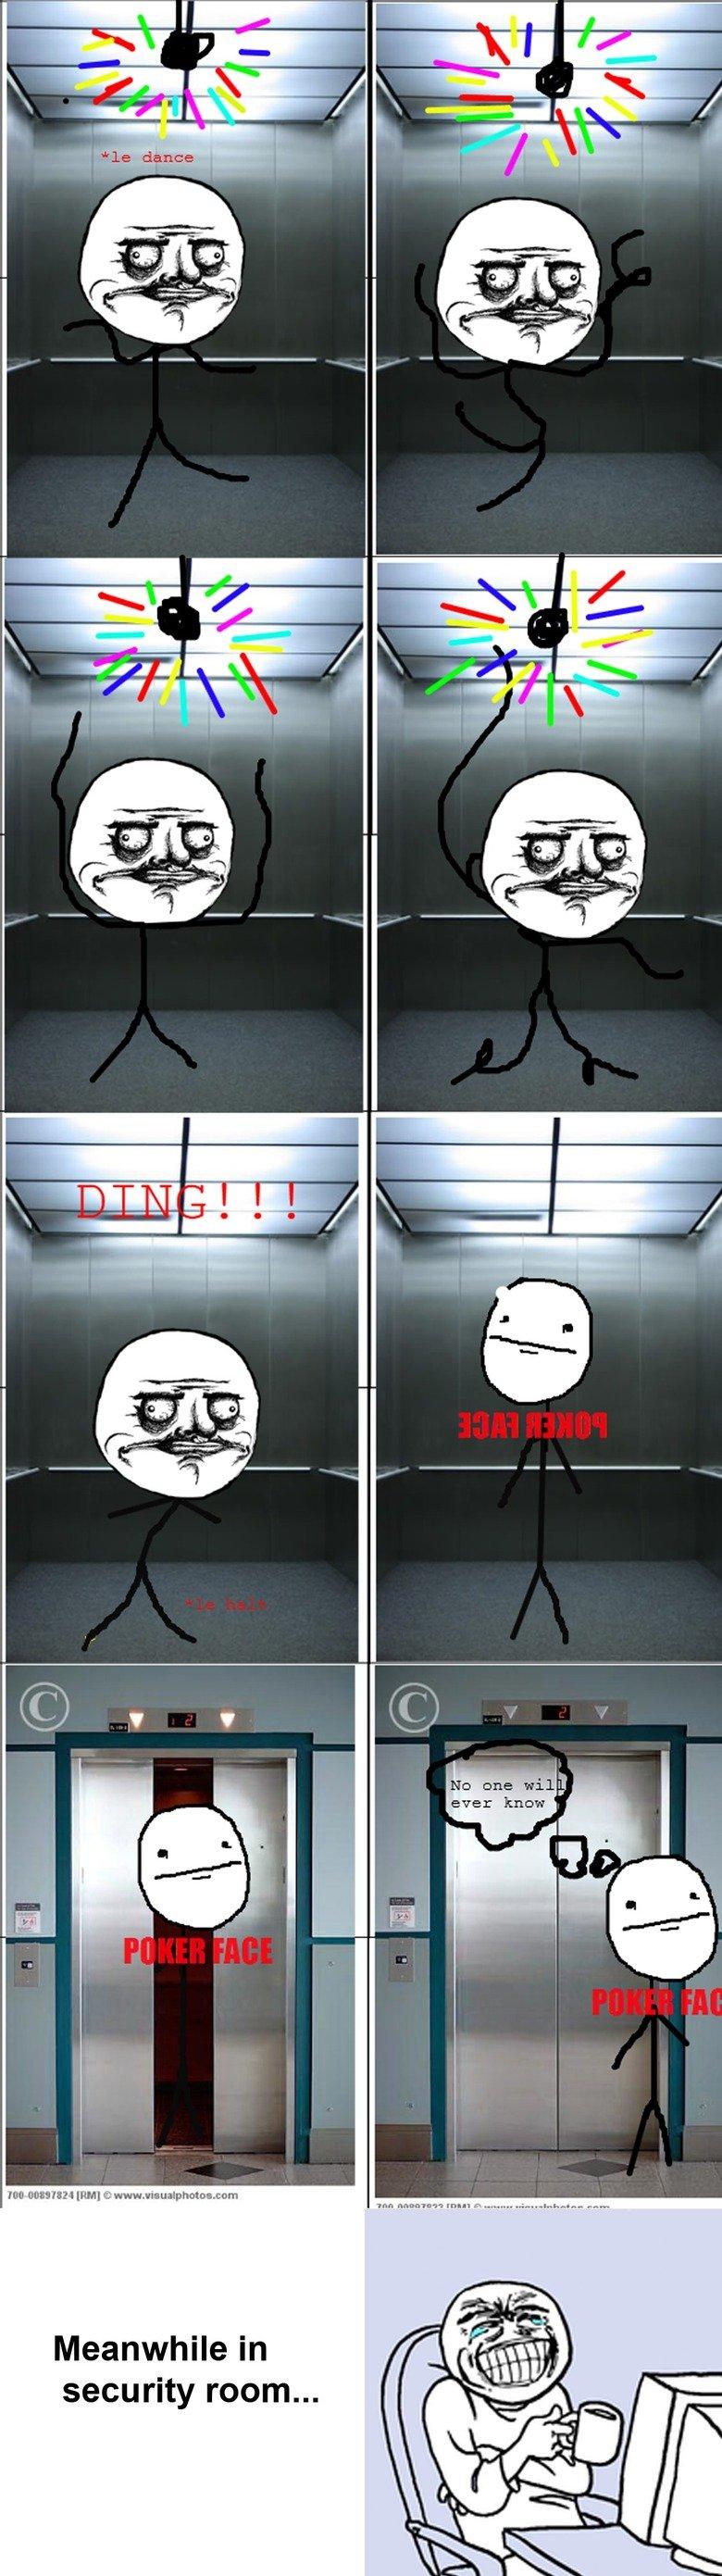 danser-ascenseur